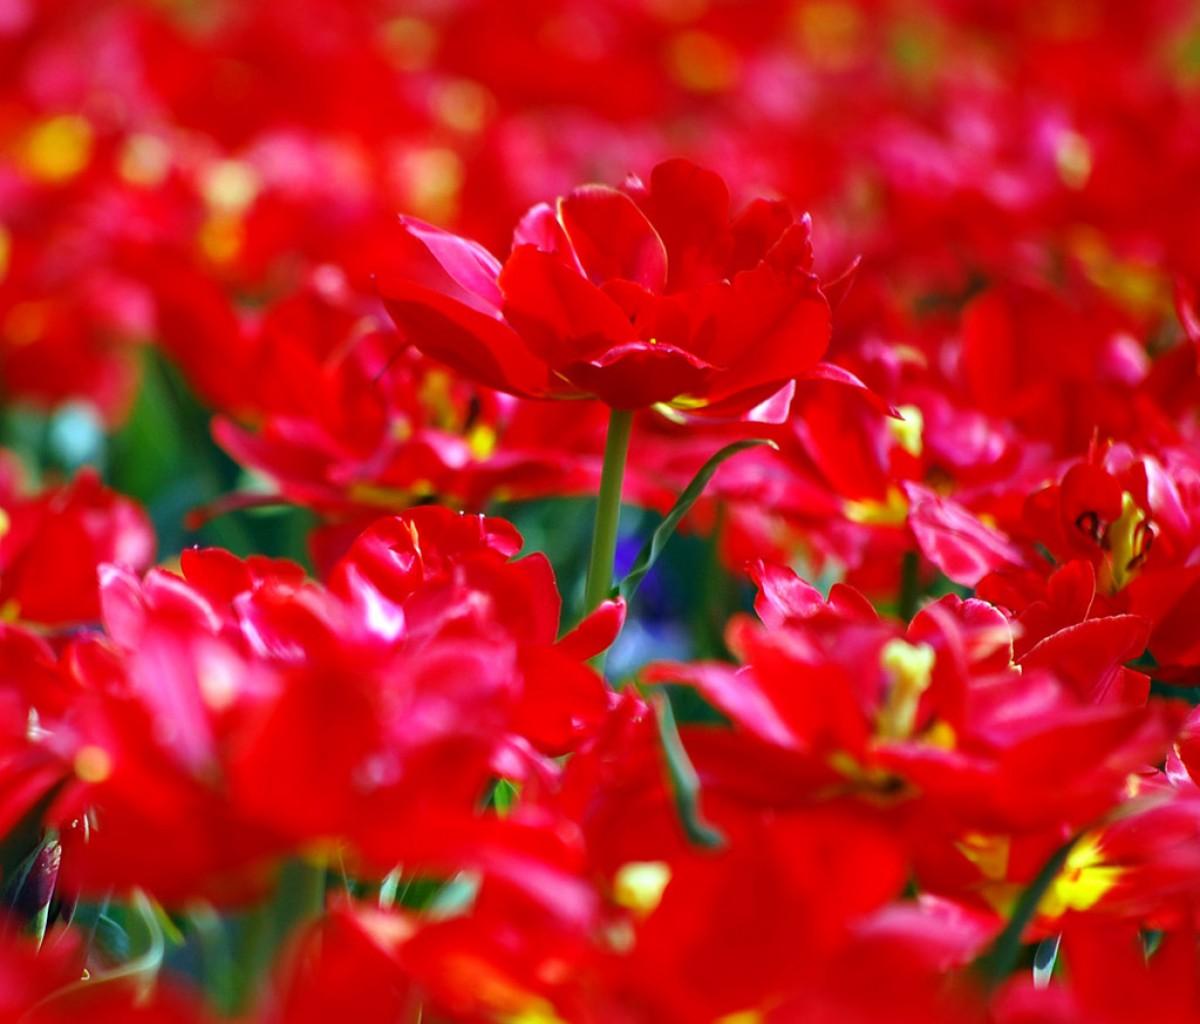 http://1.bp.blogspot.com/-WyZM3zmeC5I/T6uUEIZ6kGI/AAAAAAAACjM/Z8sNMgHTVXY/s1600/Tablet-red-tulips-1200x1024.jpg